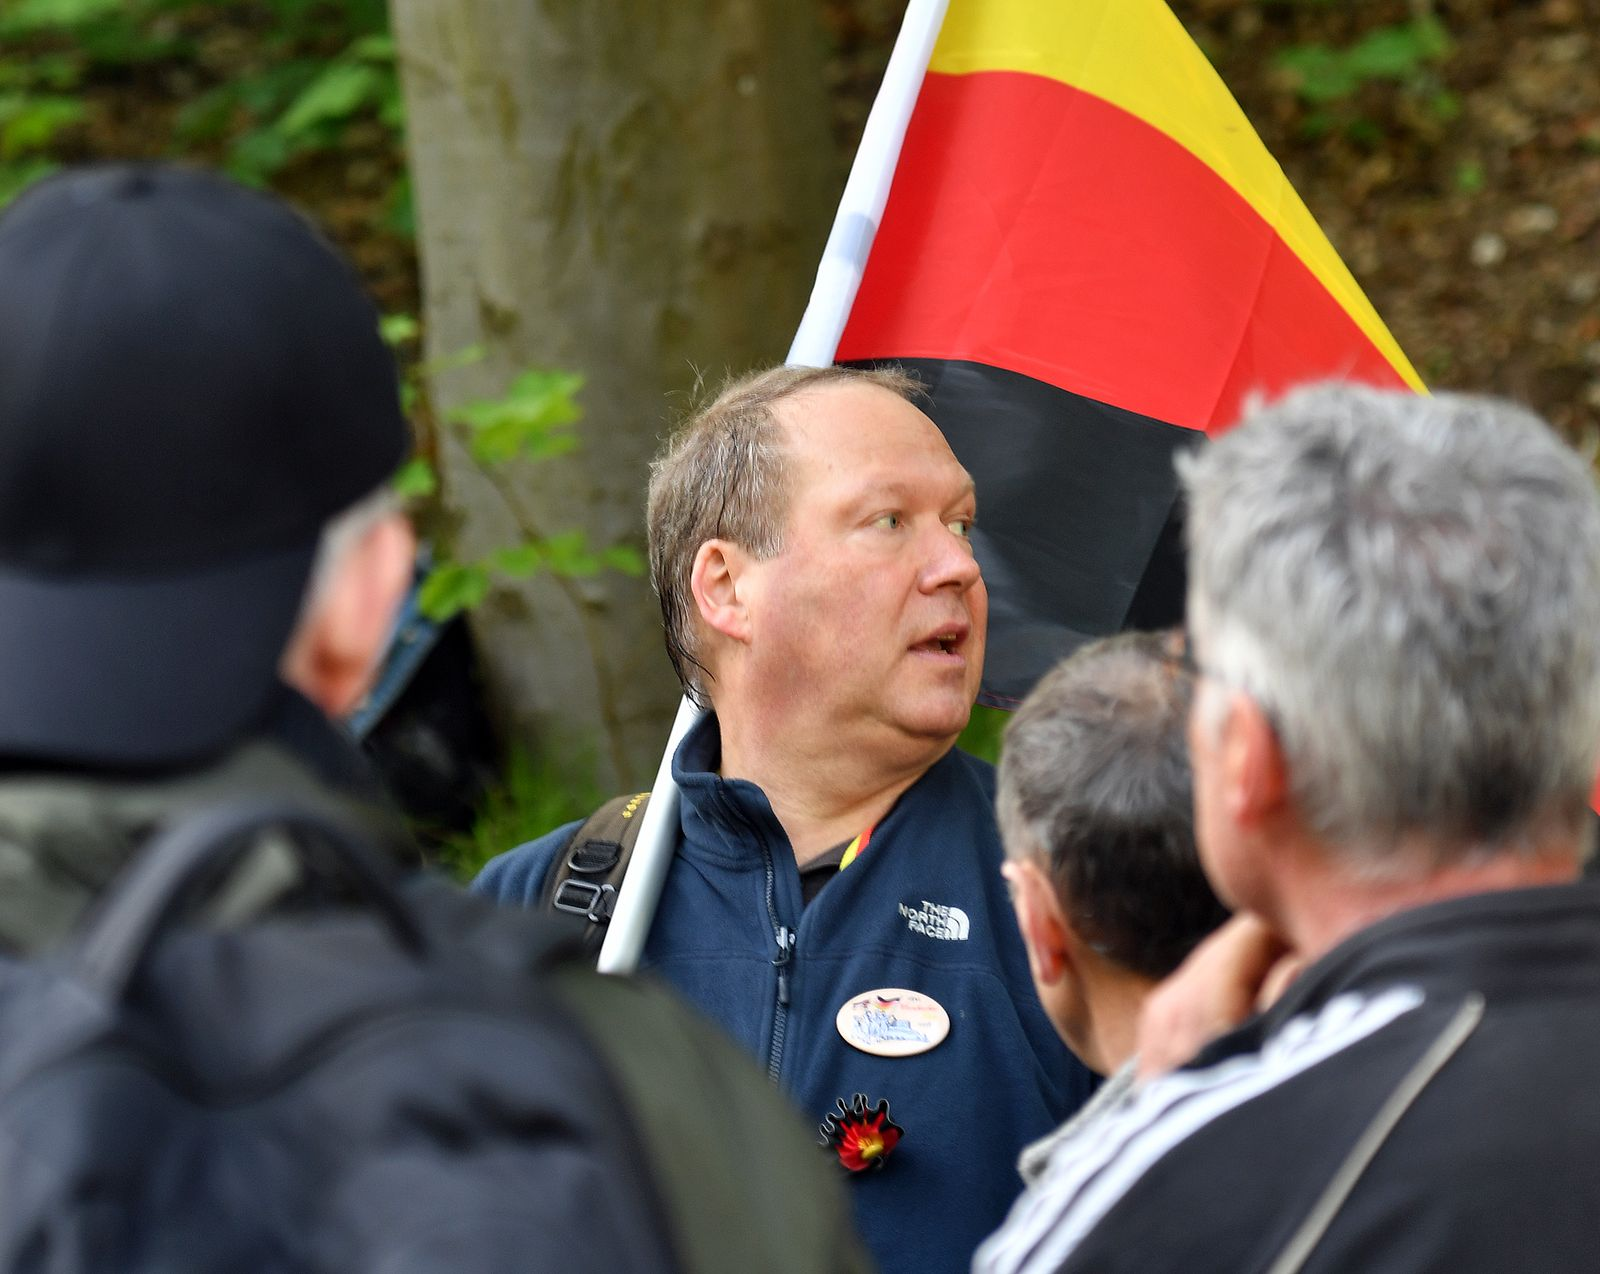 Neues_Hambacher_Fest